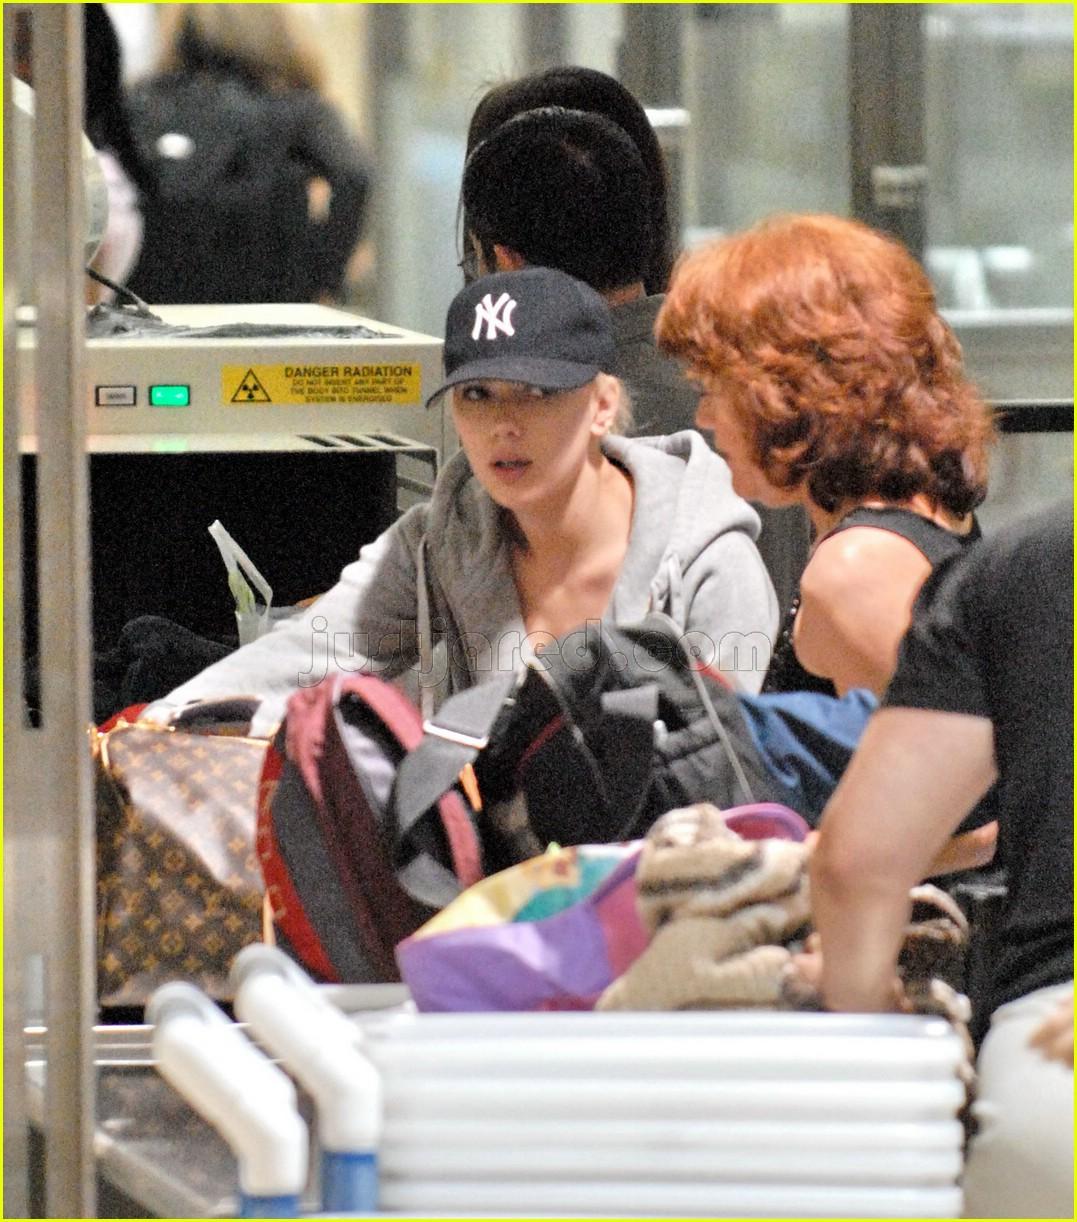 Full Sized Photo of sc... Scarlett Johansson